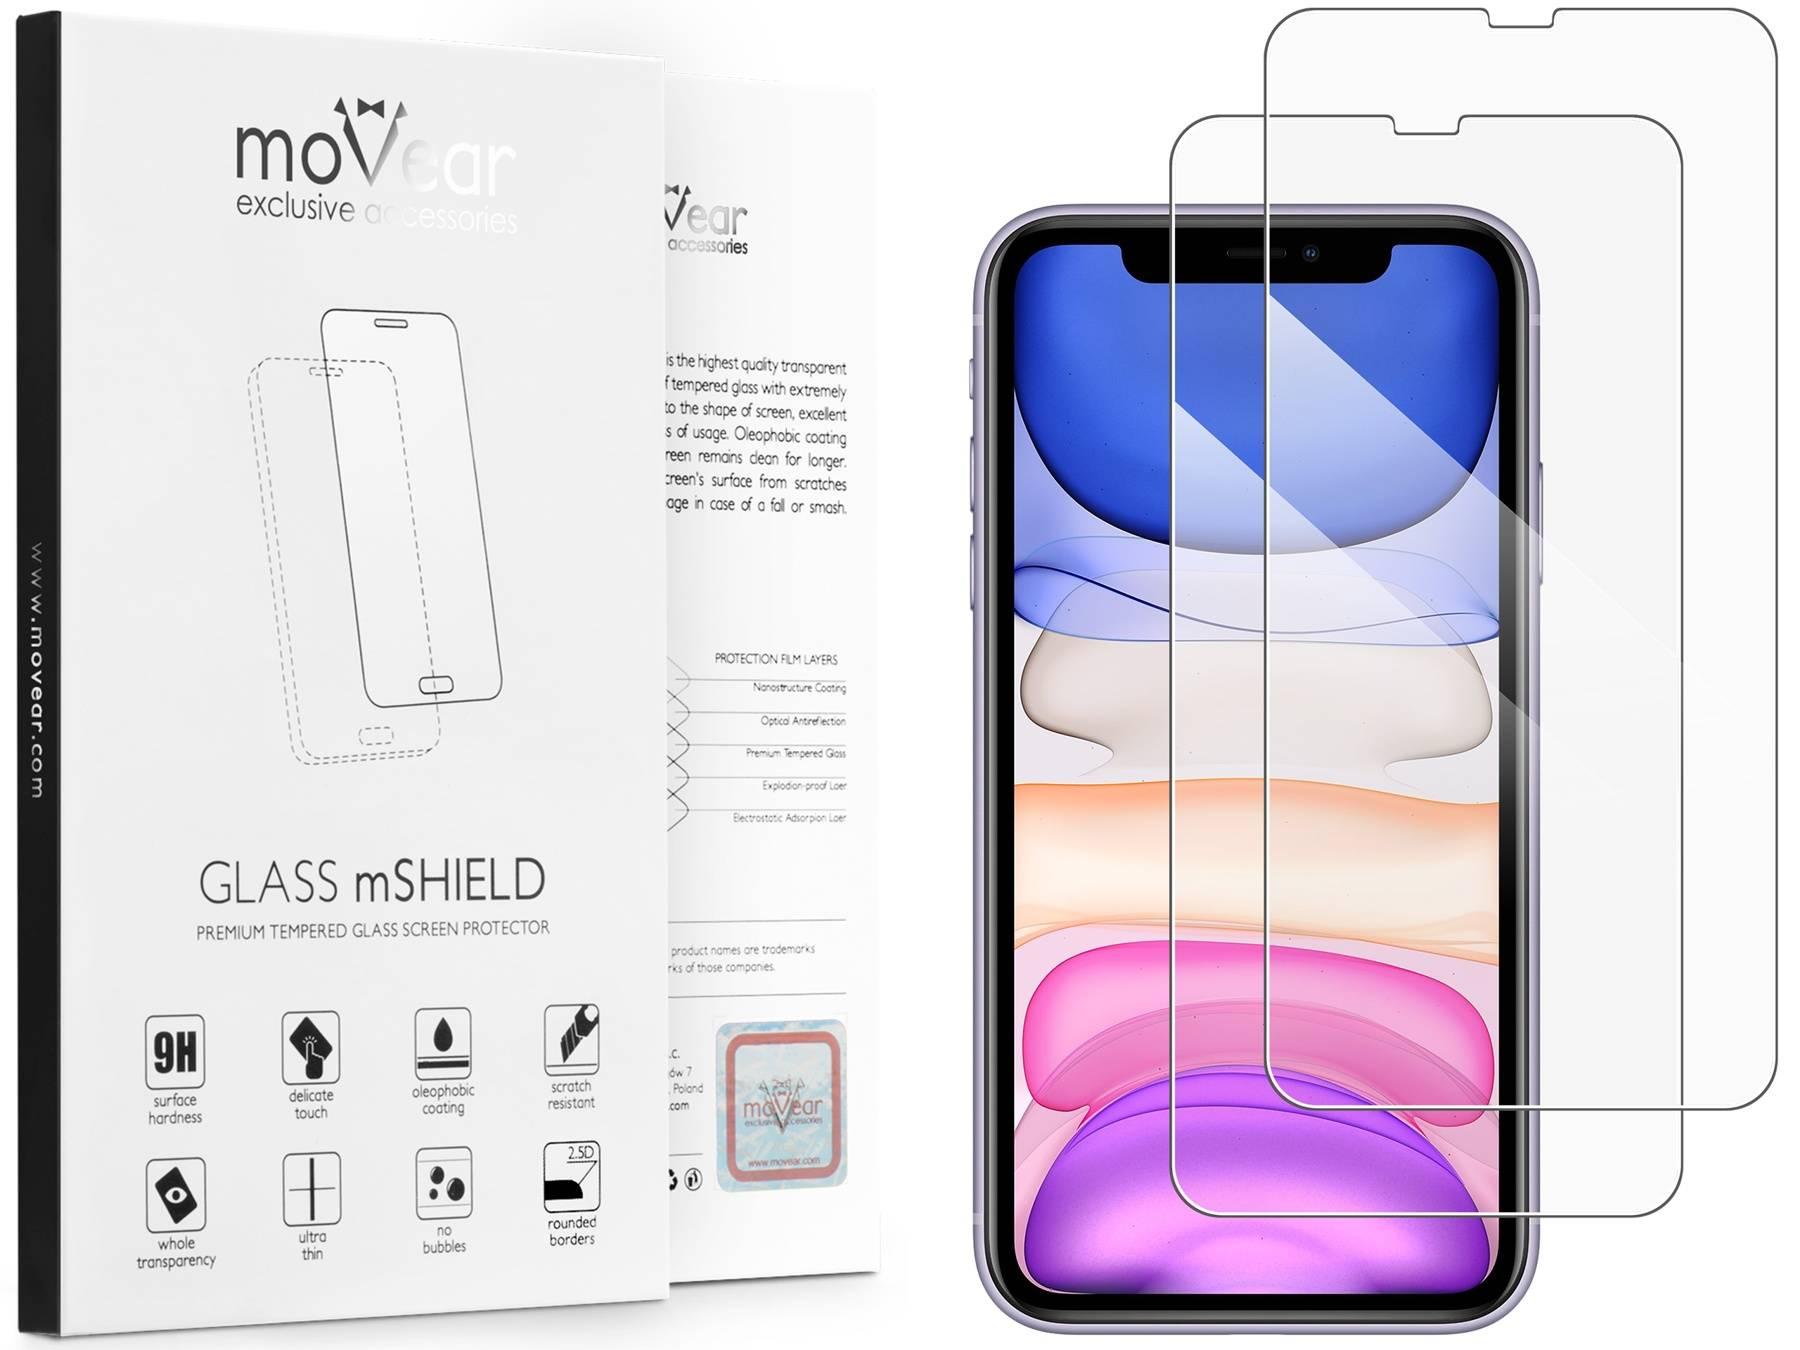 2 szt. | moVear Szkło Hartowane 2.5D na Apple iPhone Xr | do etui, 9H | GLASS mSHIELD Transparentny